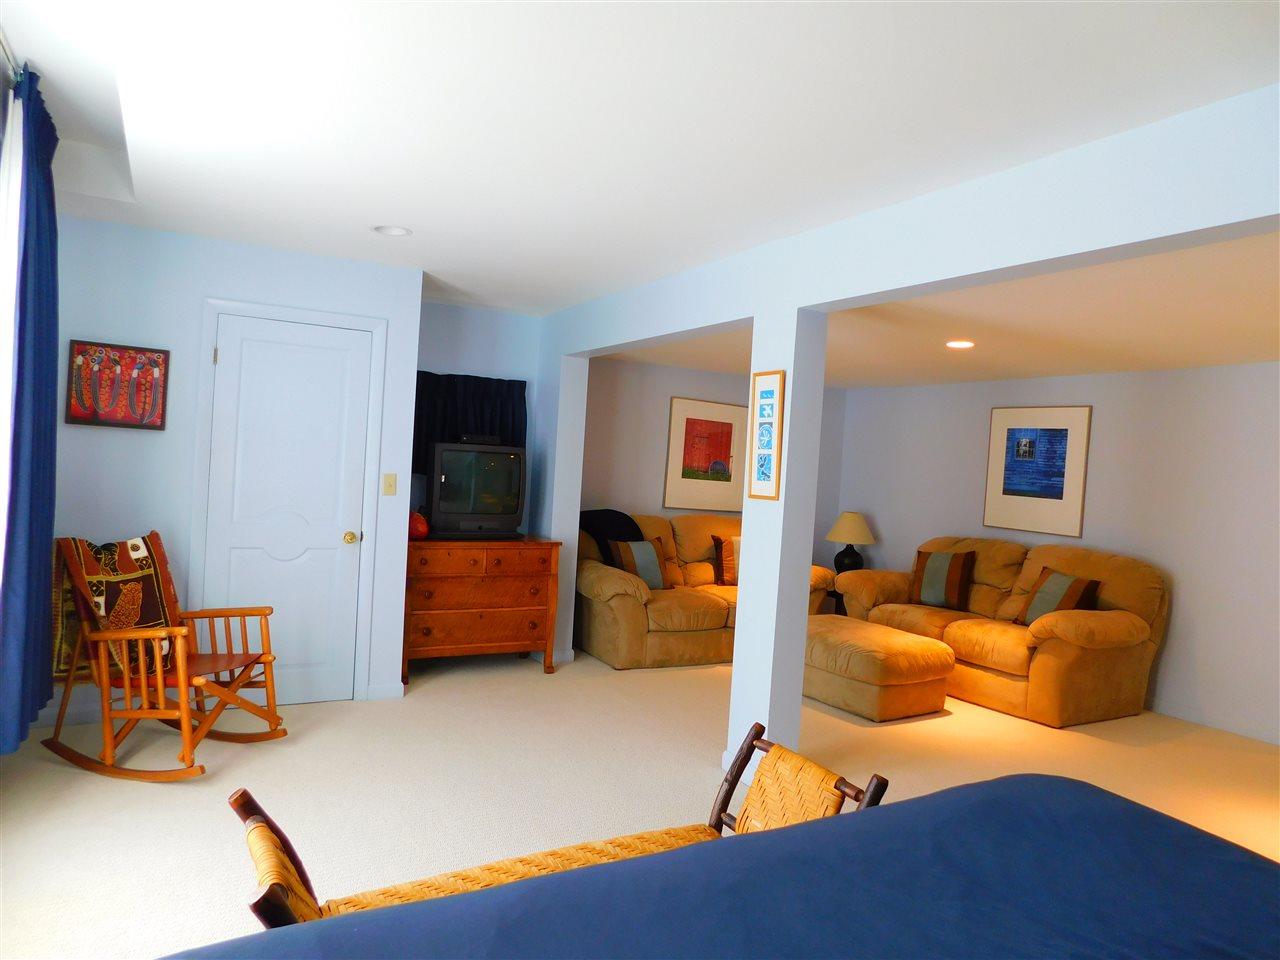 Mount-Snow-Real-Estate-4463107-16